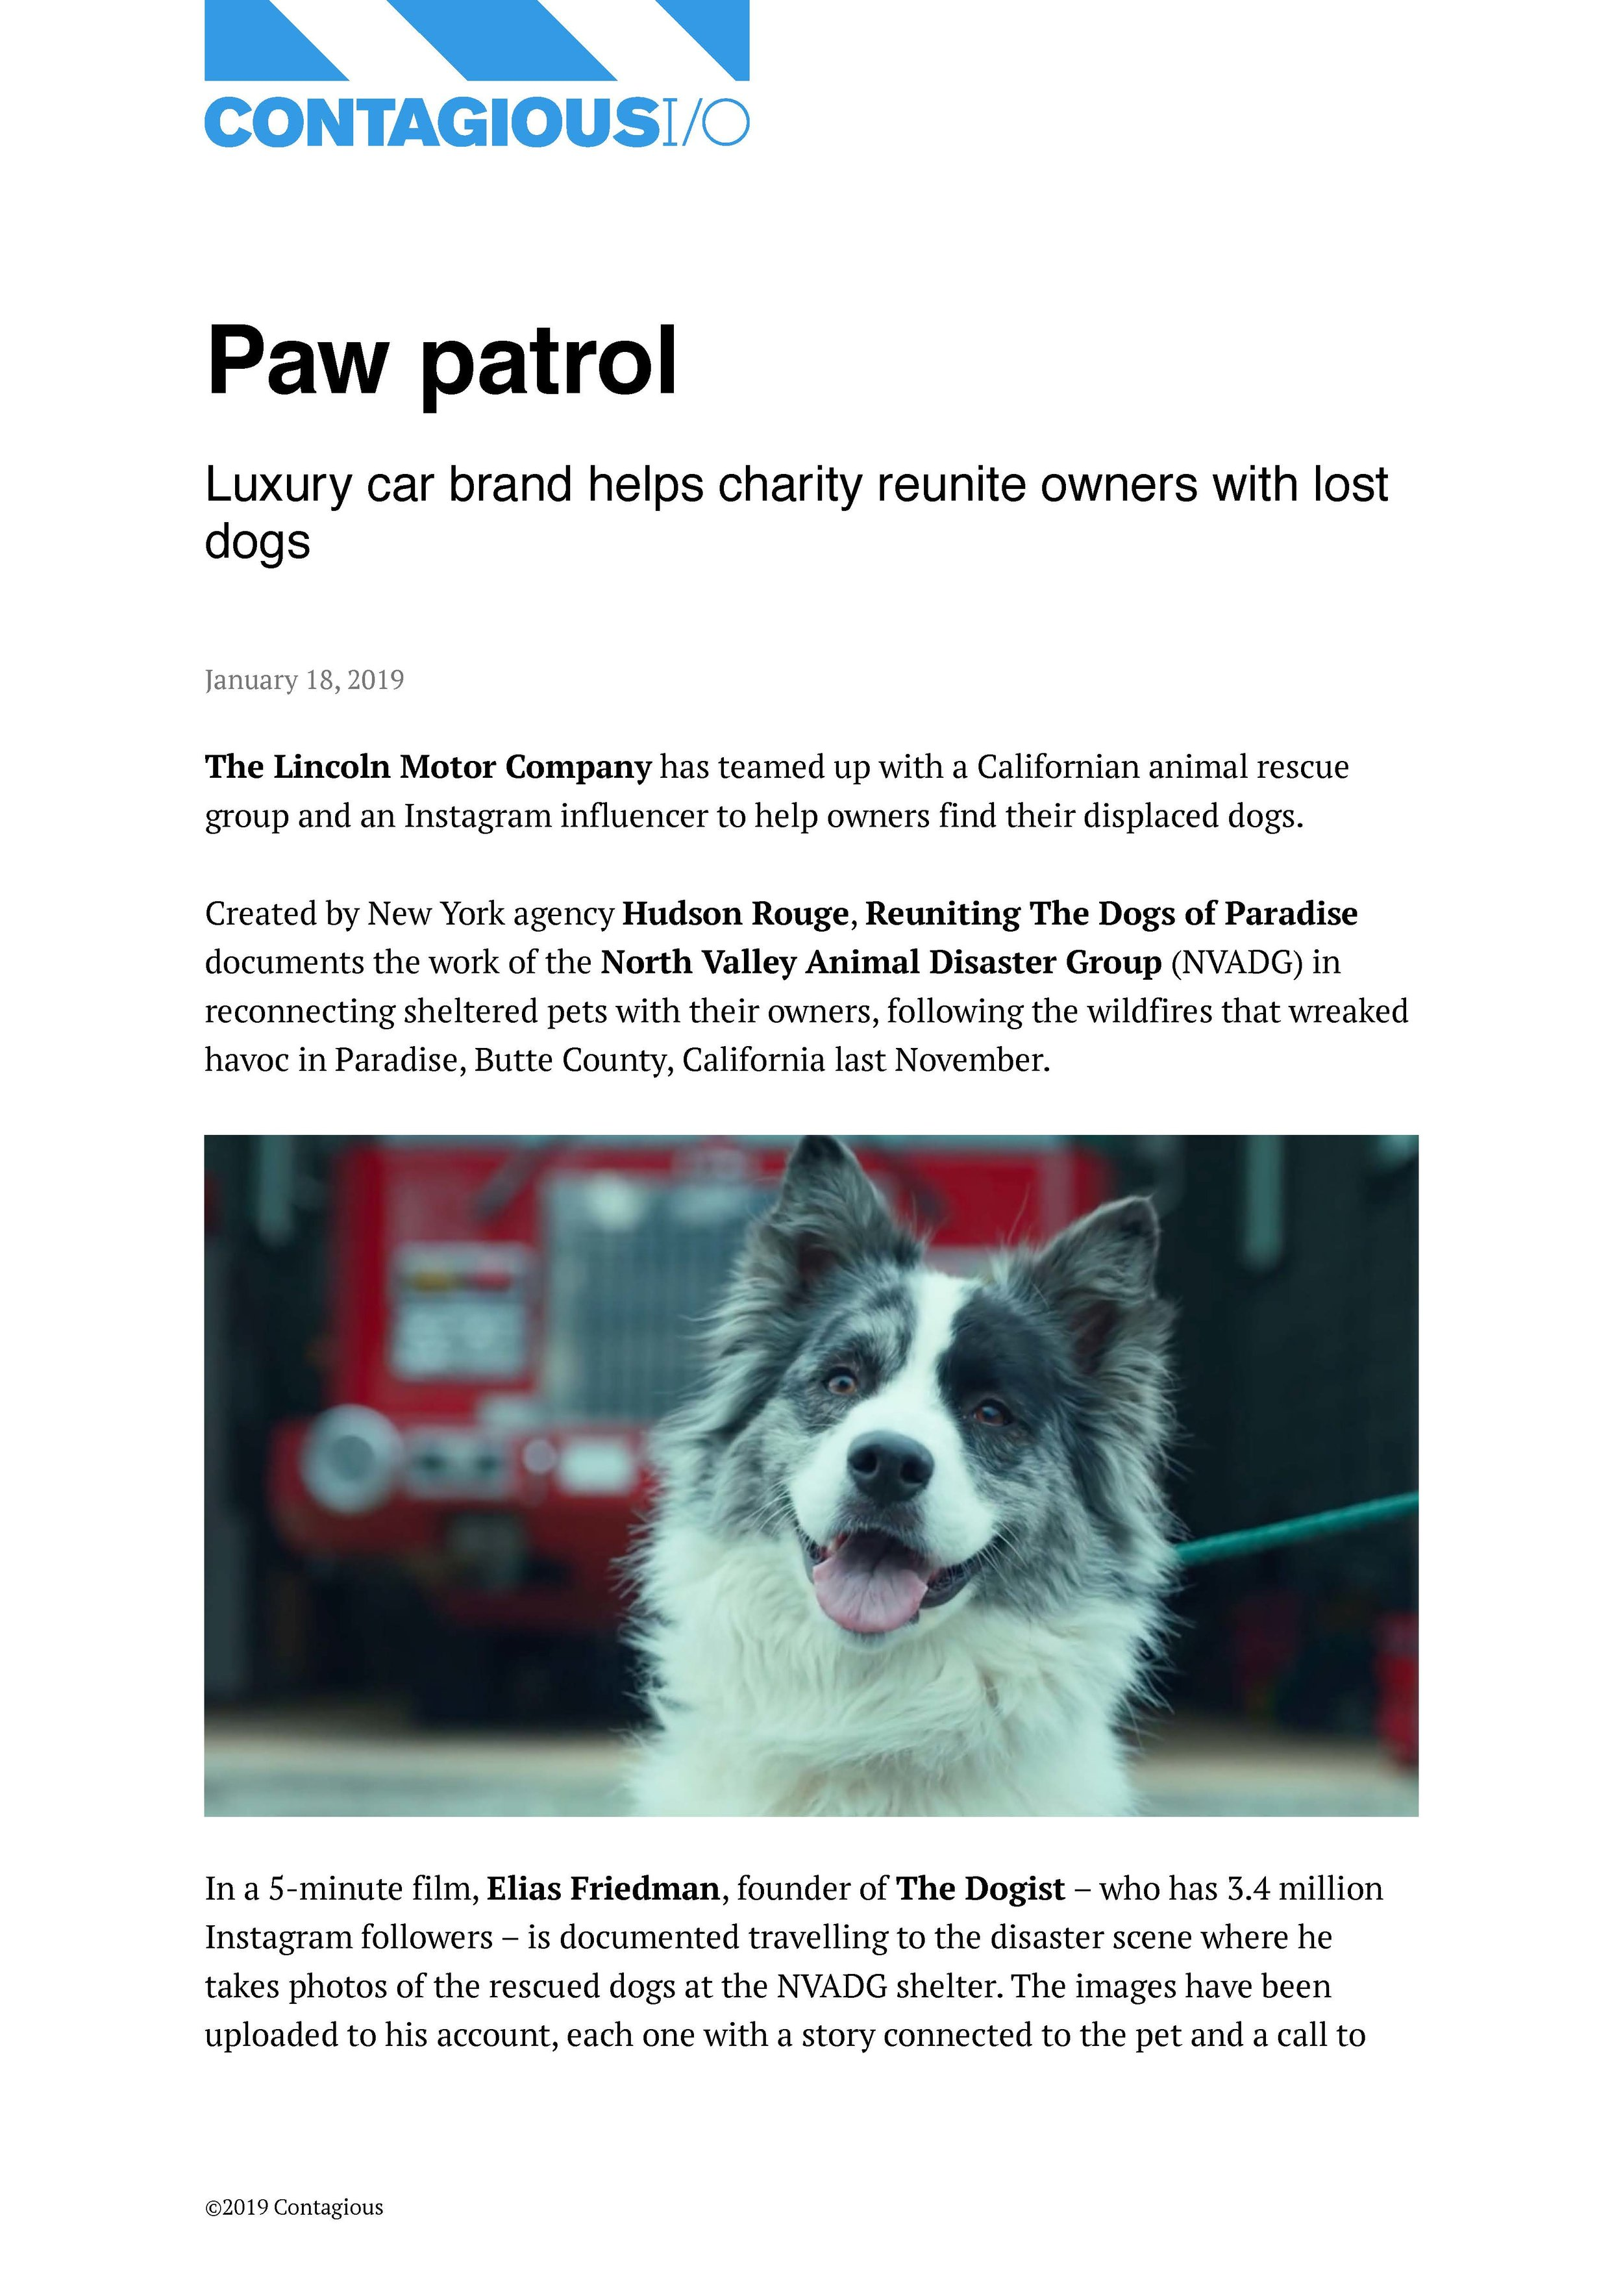 paw-patrol_Page_1.jpg